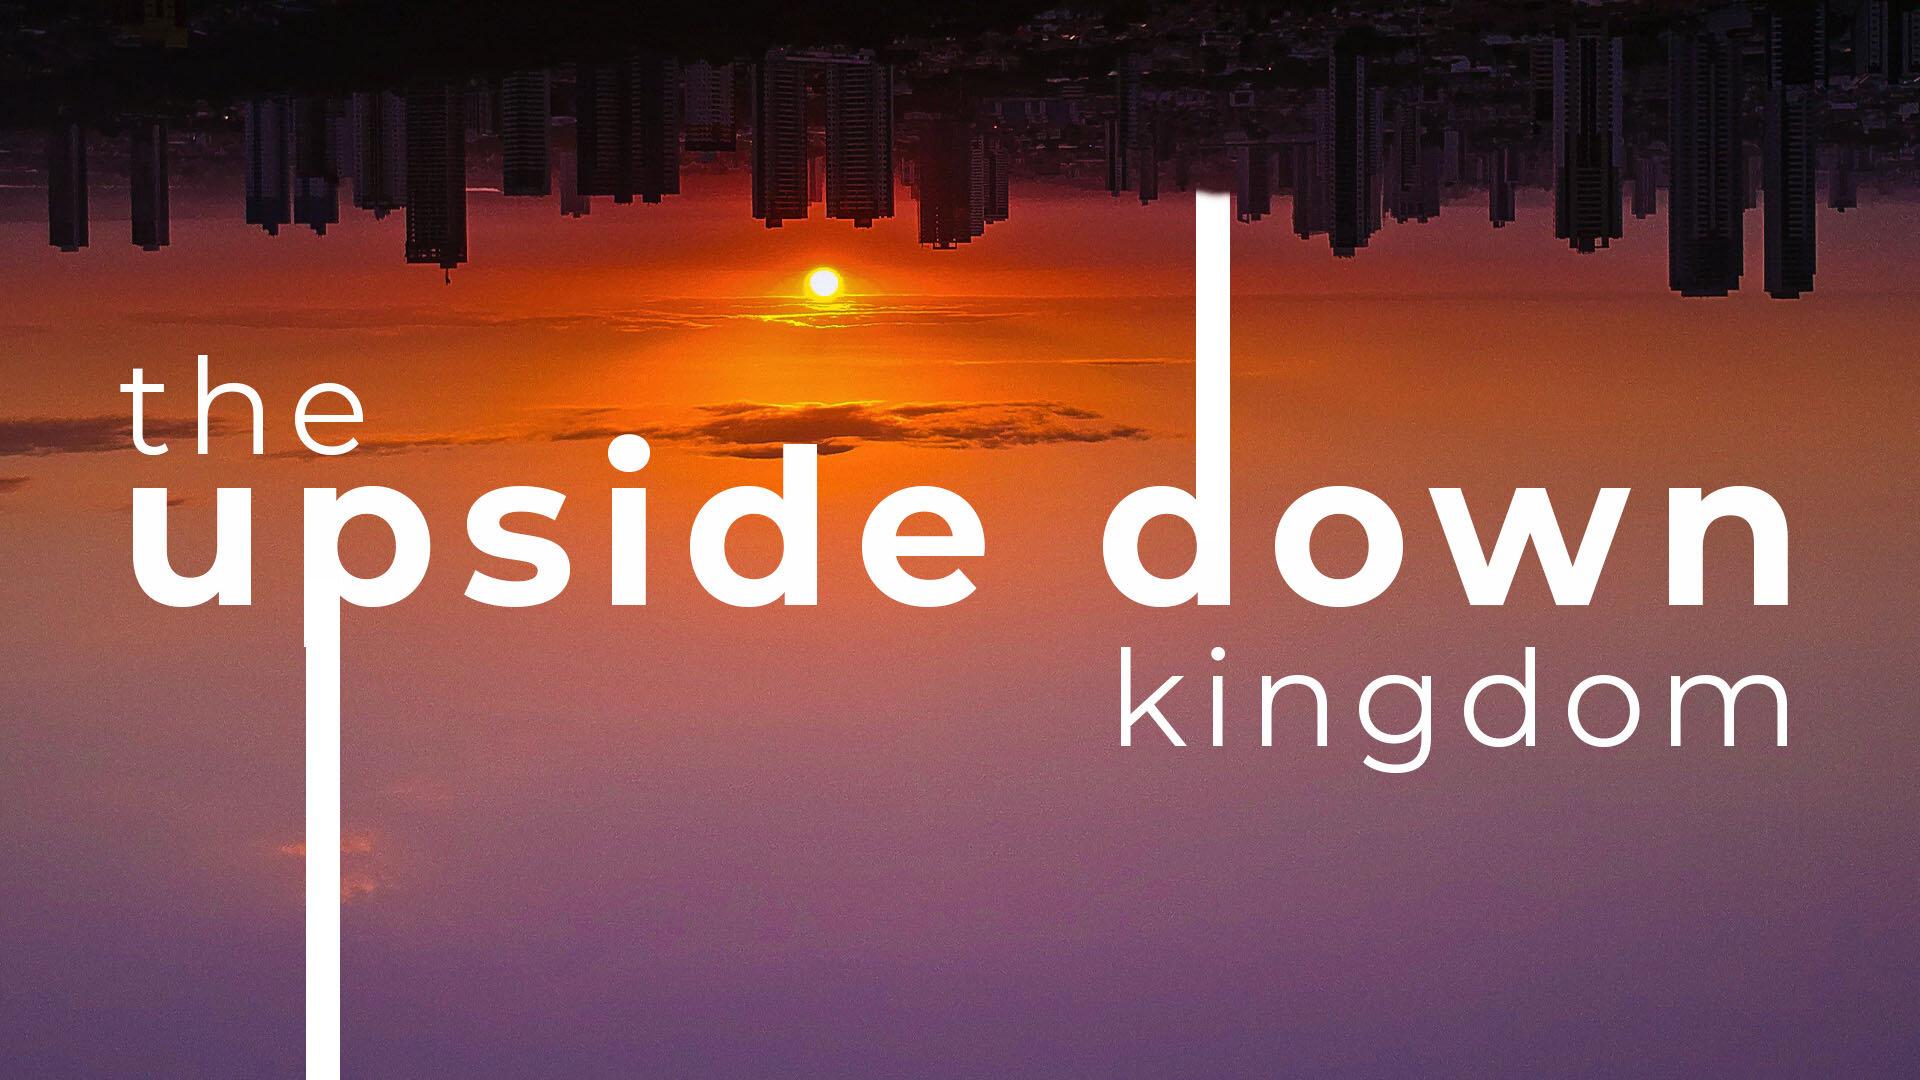 upside down kingdom.jpg